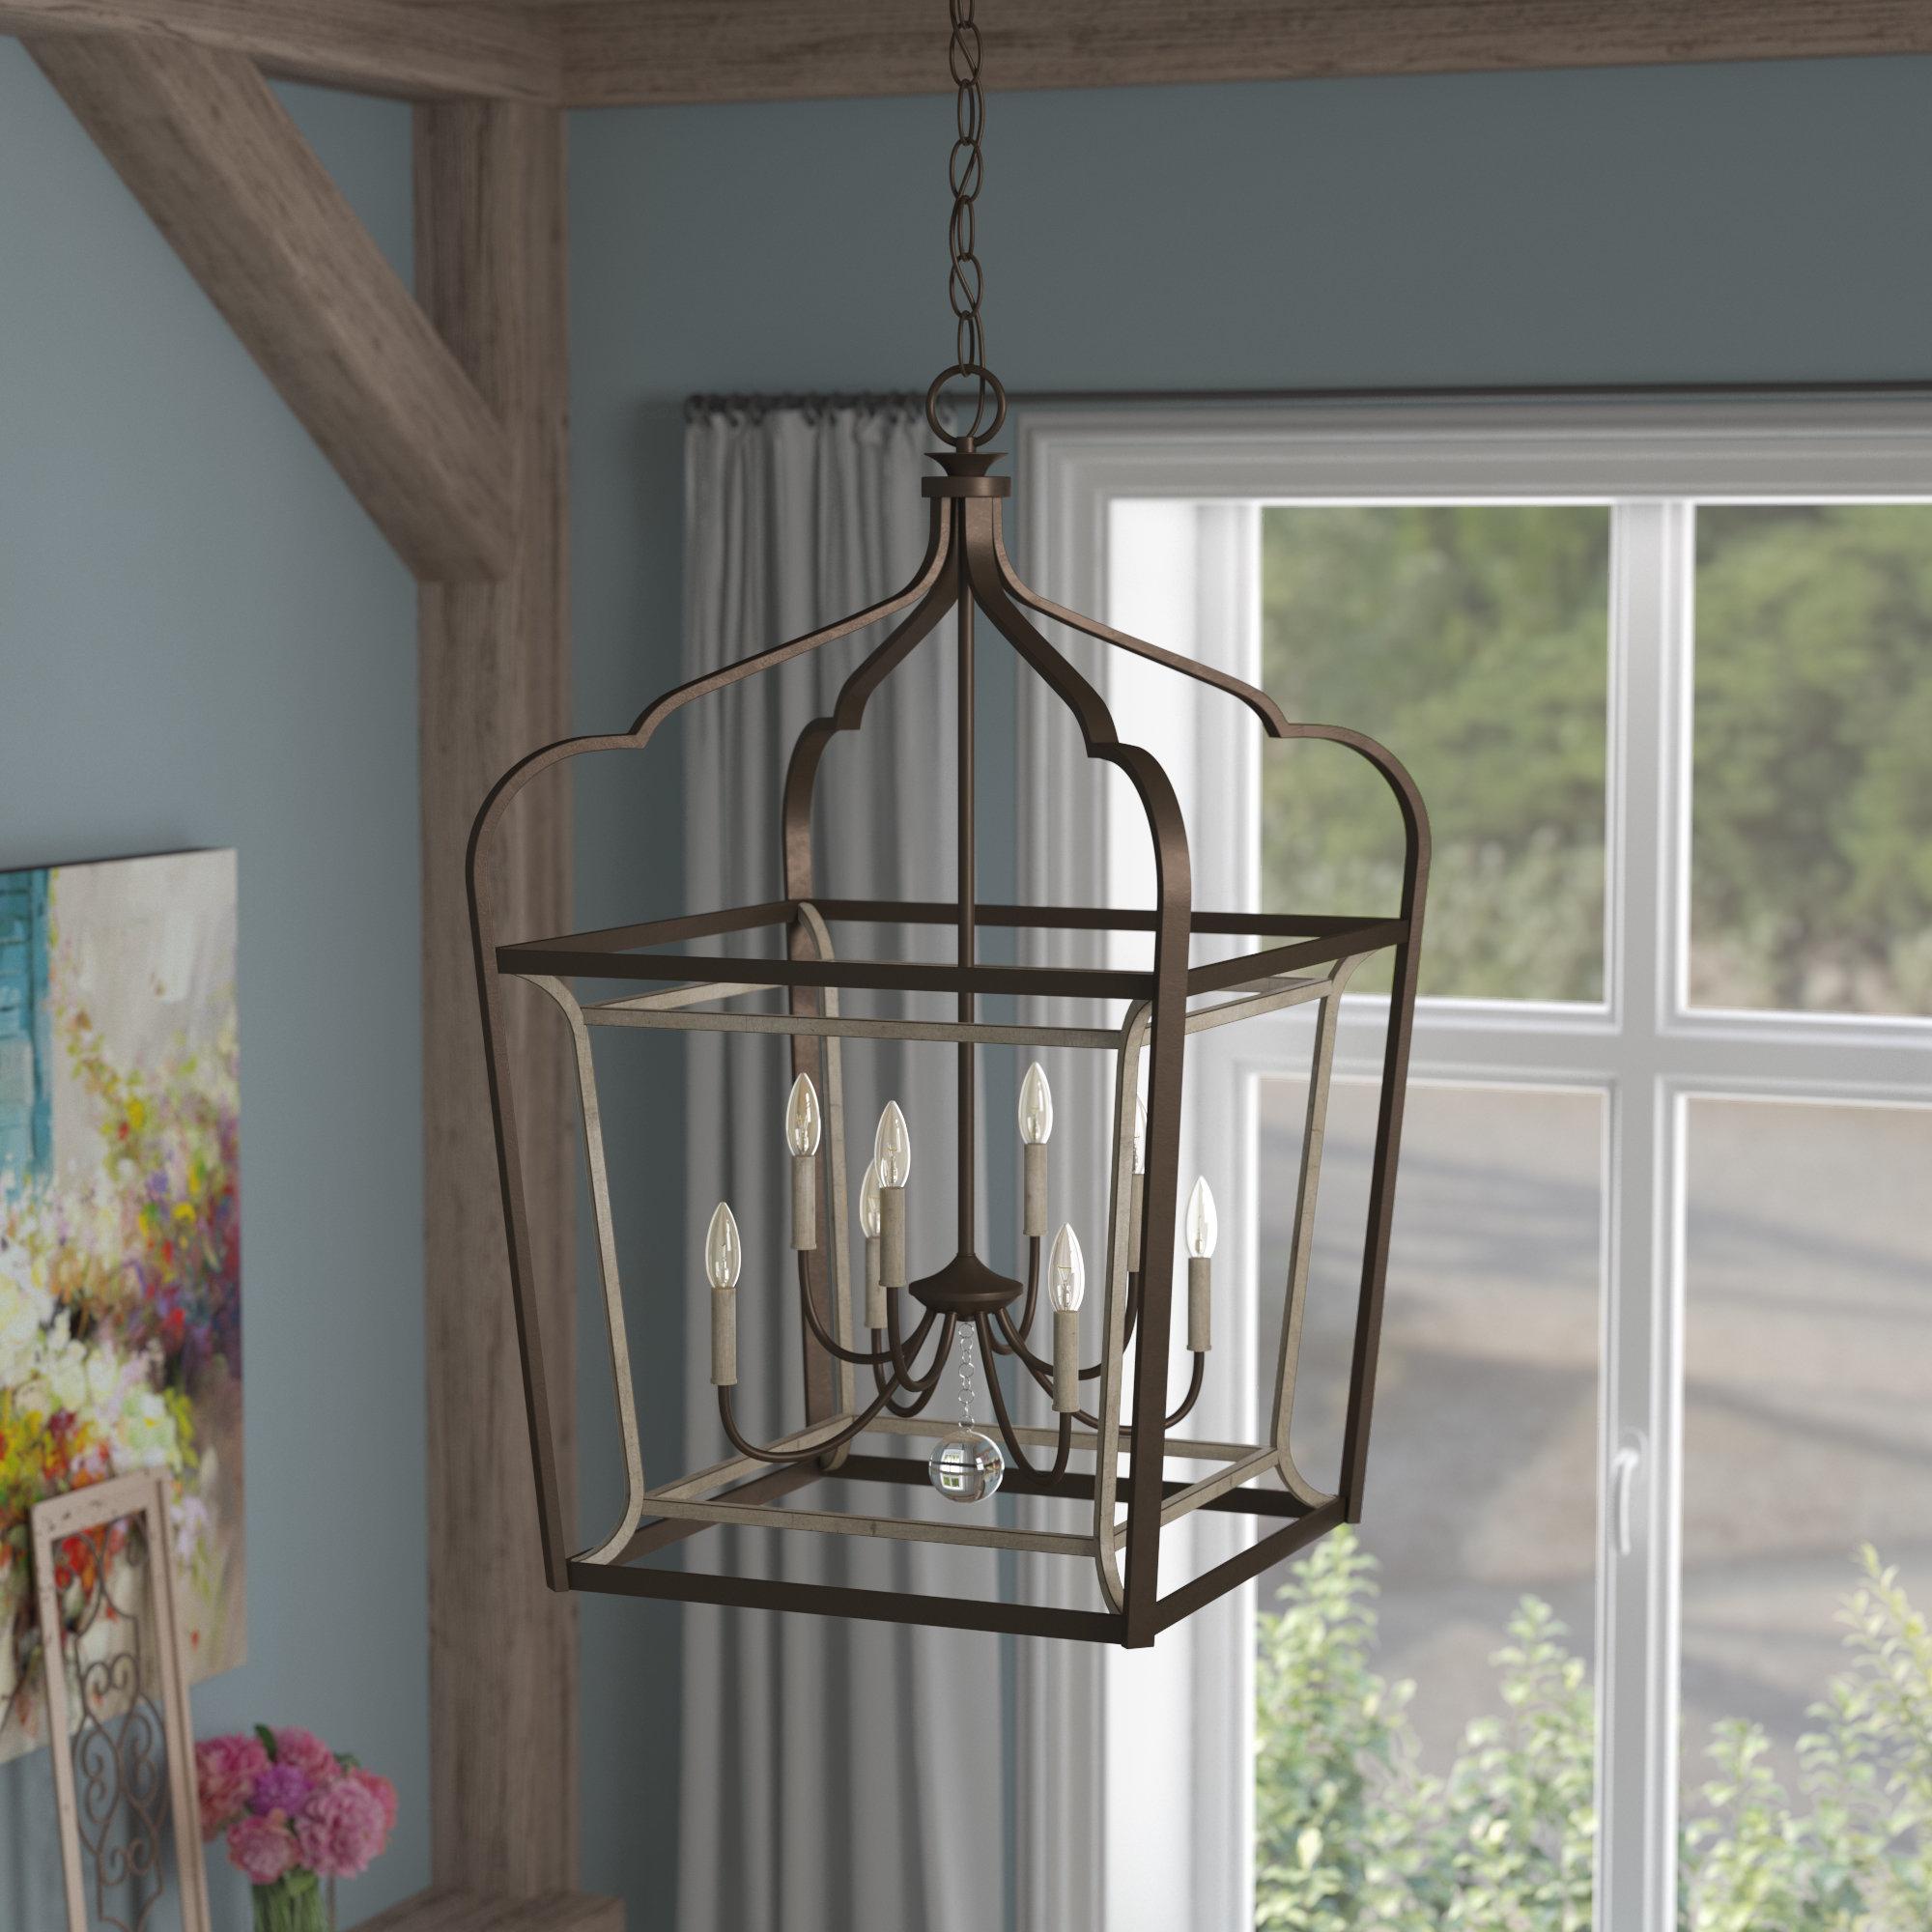 Evangeline 8 Light Lantern Geometric Pendant With Fashionable Carmen 8 Light Lantern Geometric Pendants (Gallery 24 of 25)